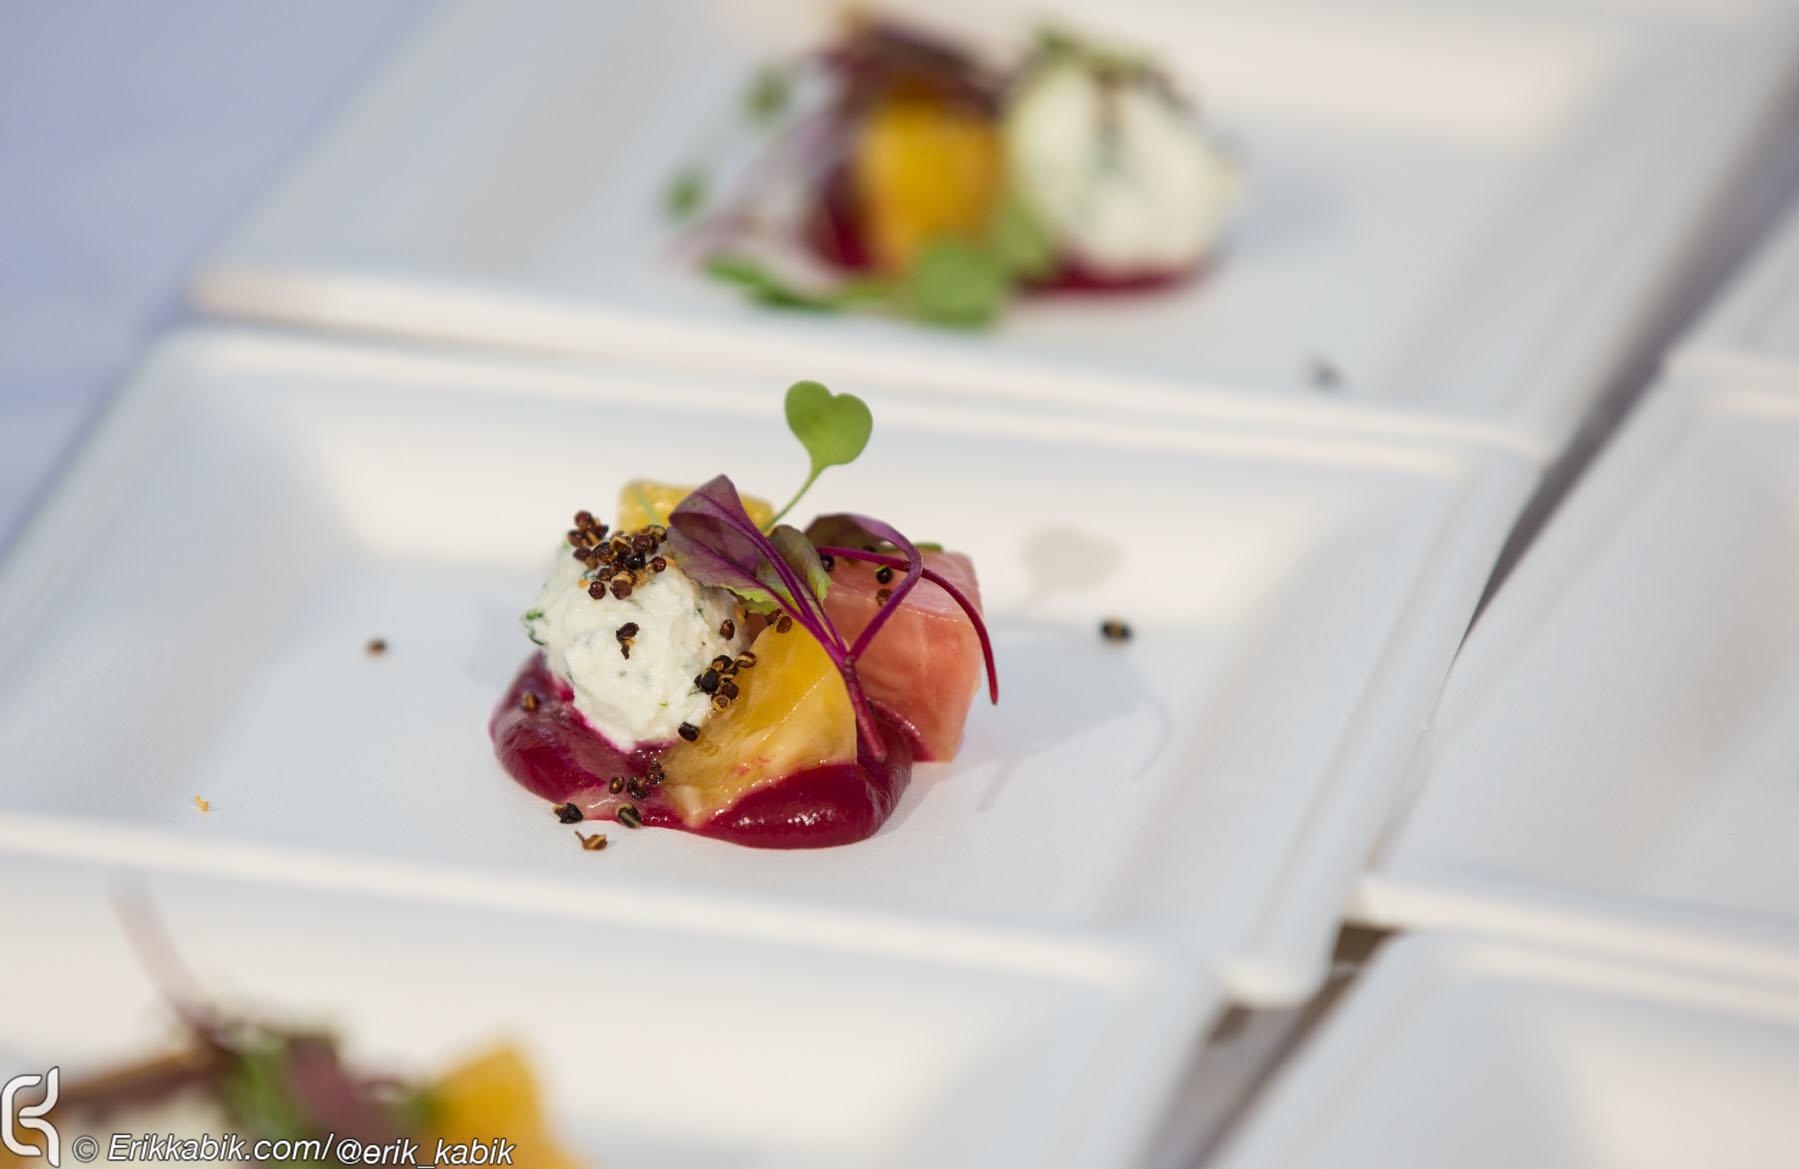 6_5_15_batali_carnival_cuisine_kabik-115.jpg